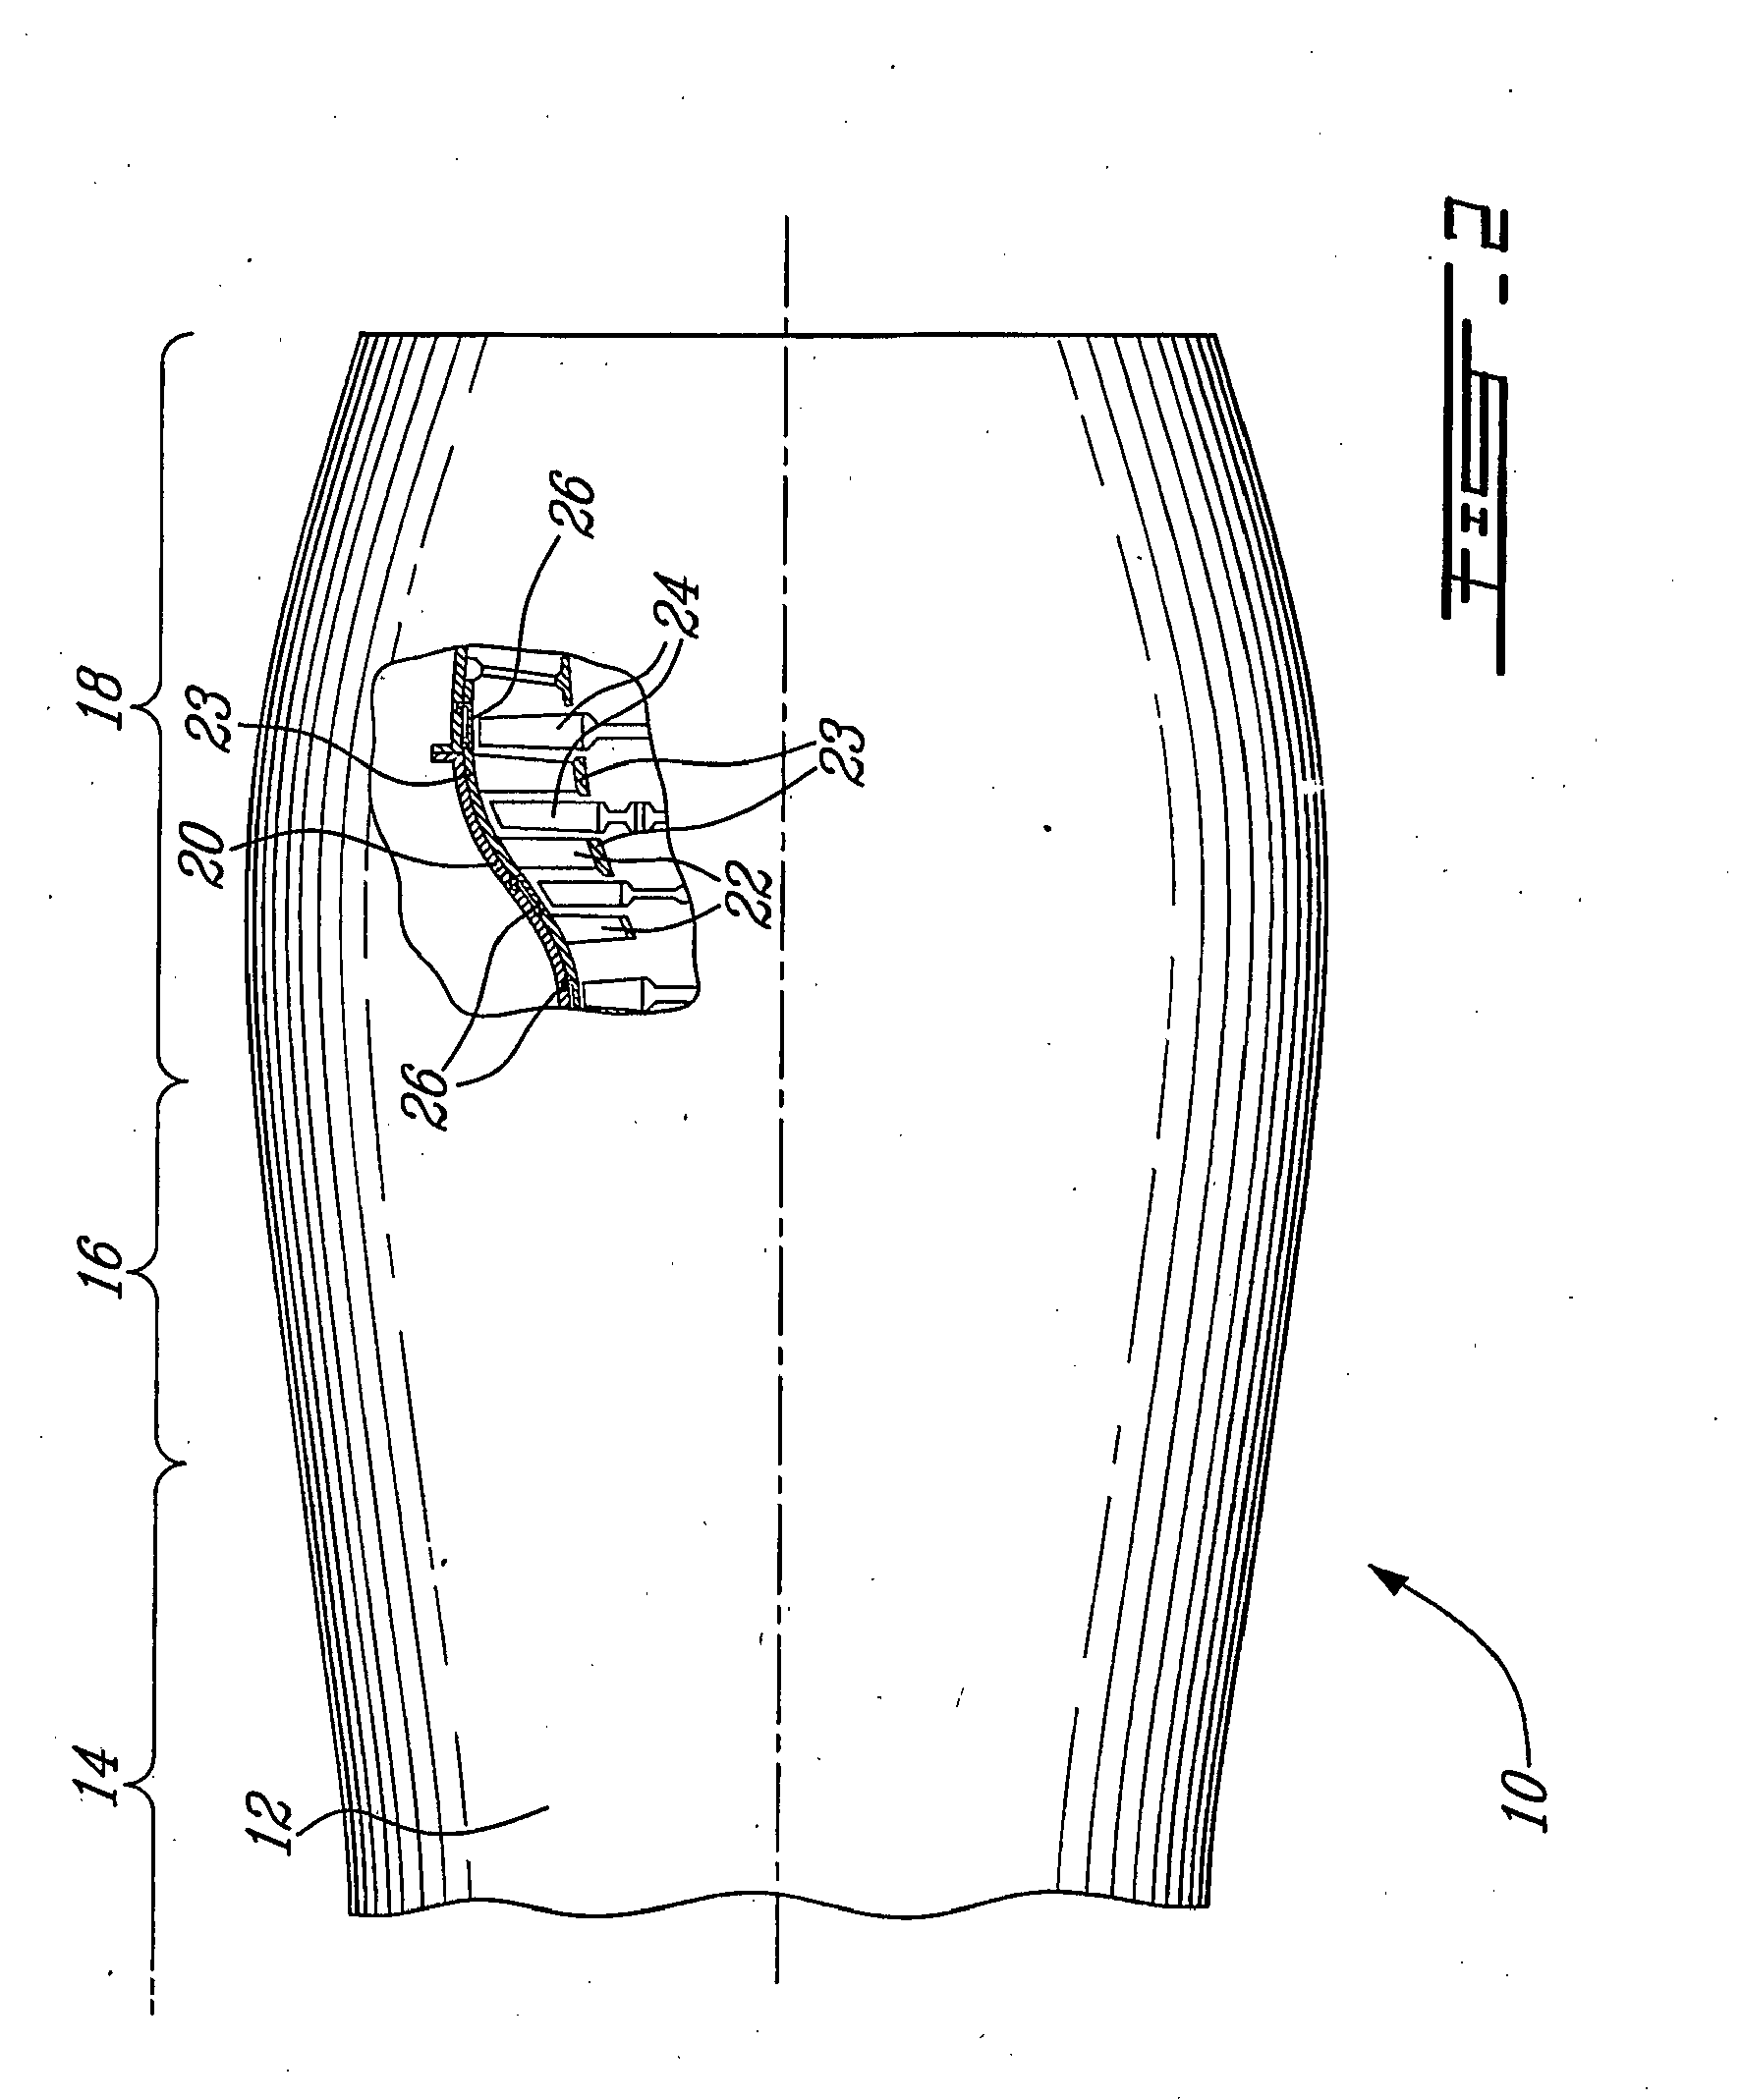 Patent EP B1 Gas turbine blade shroud with improved